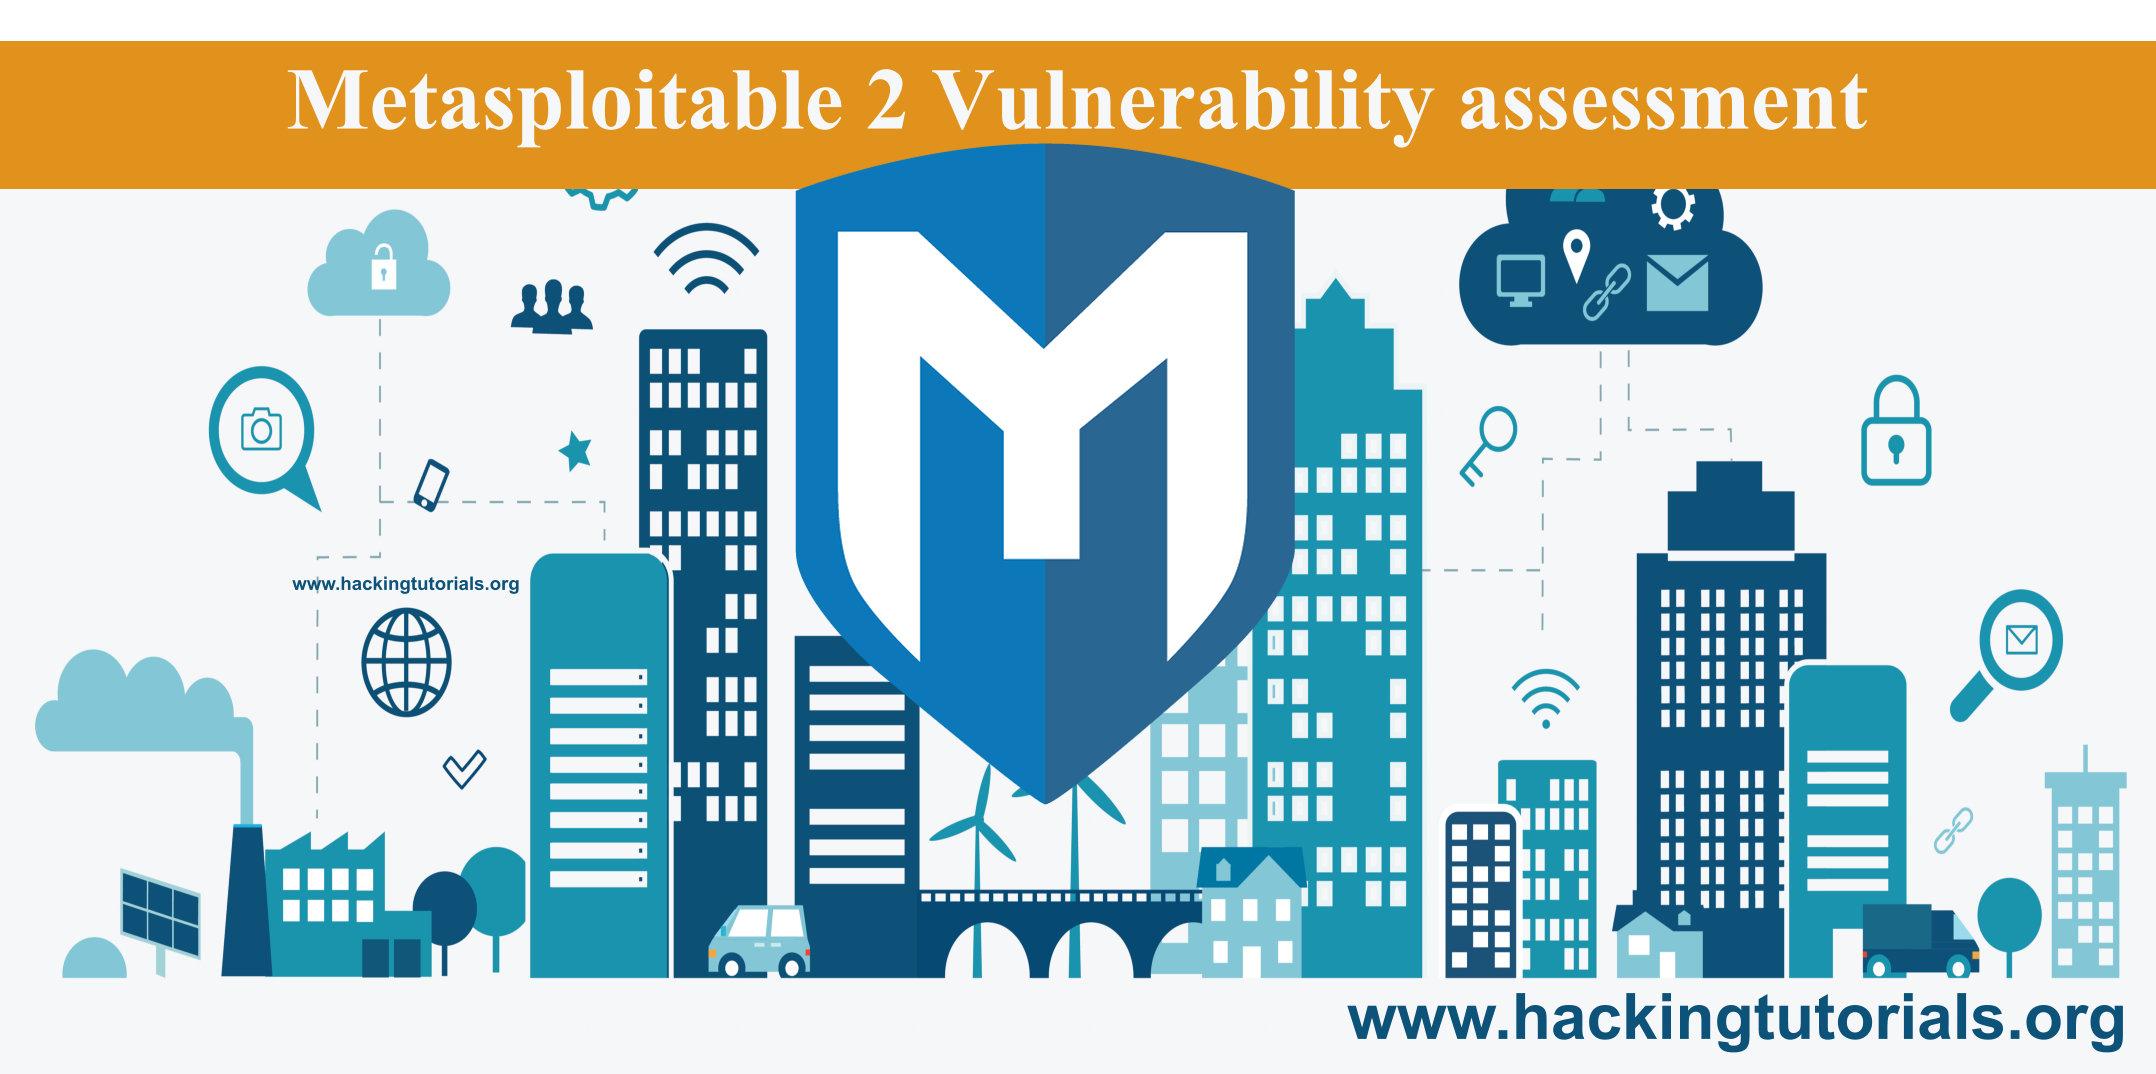 Metasploitable 2 vulnerability assessment - Hacking Tutorials